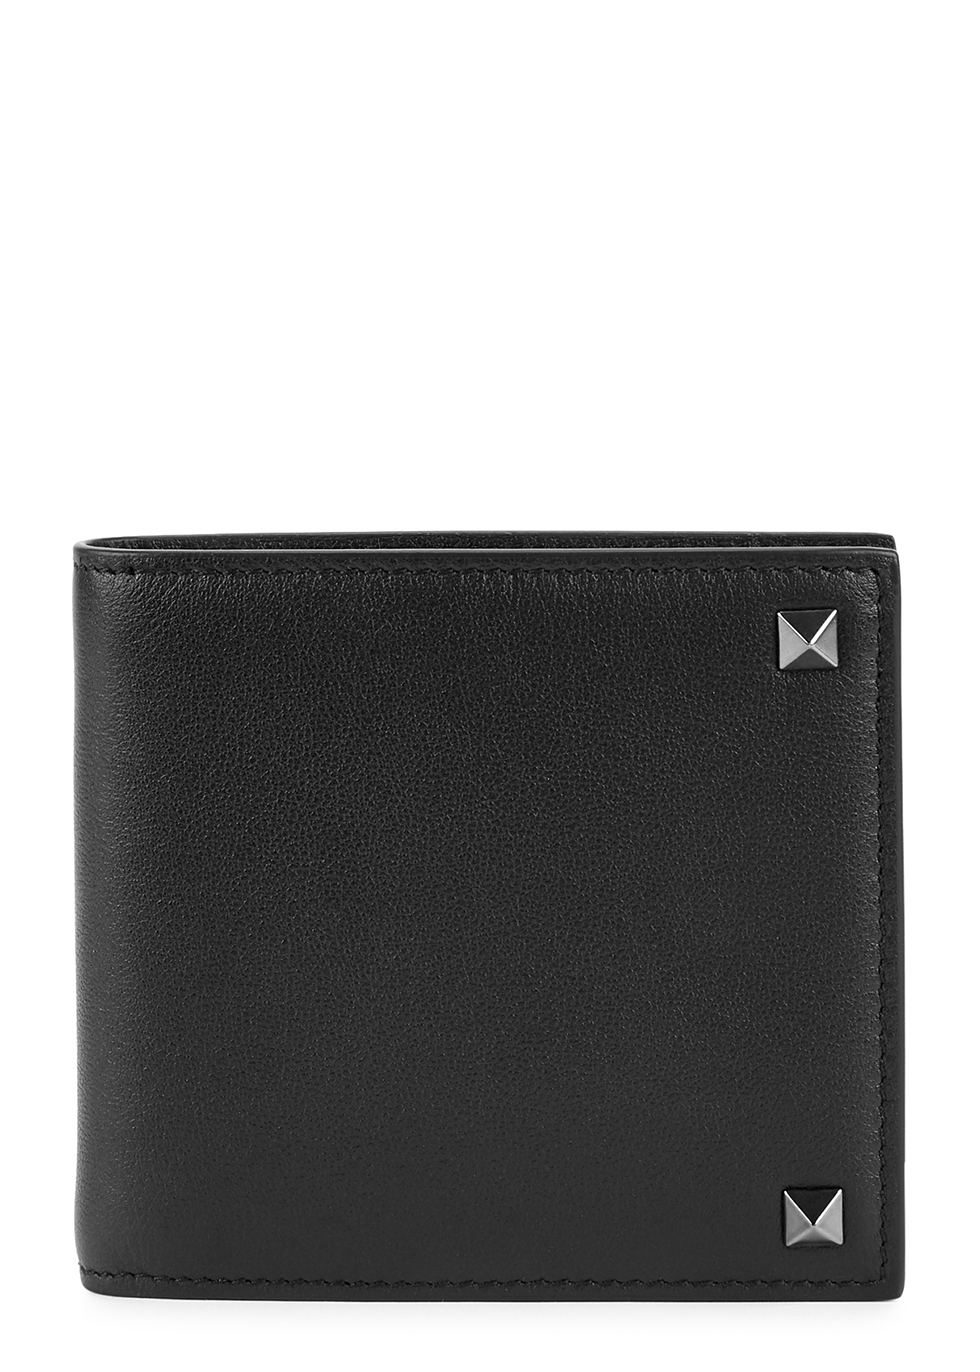 Valentino Garavani Rockstud black leather wallet